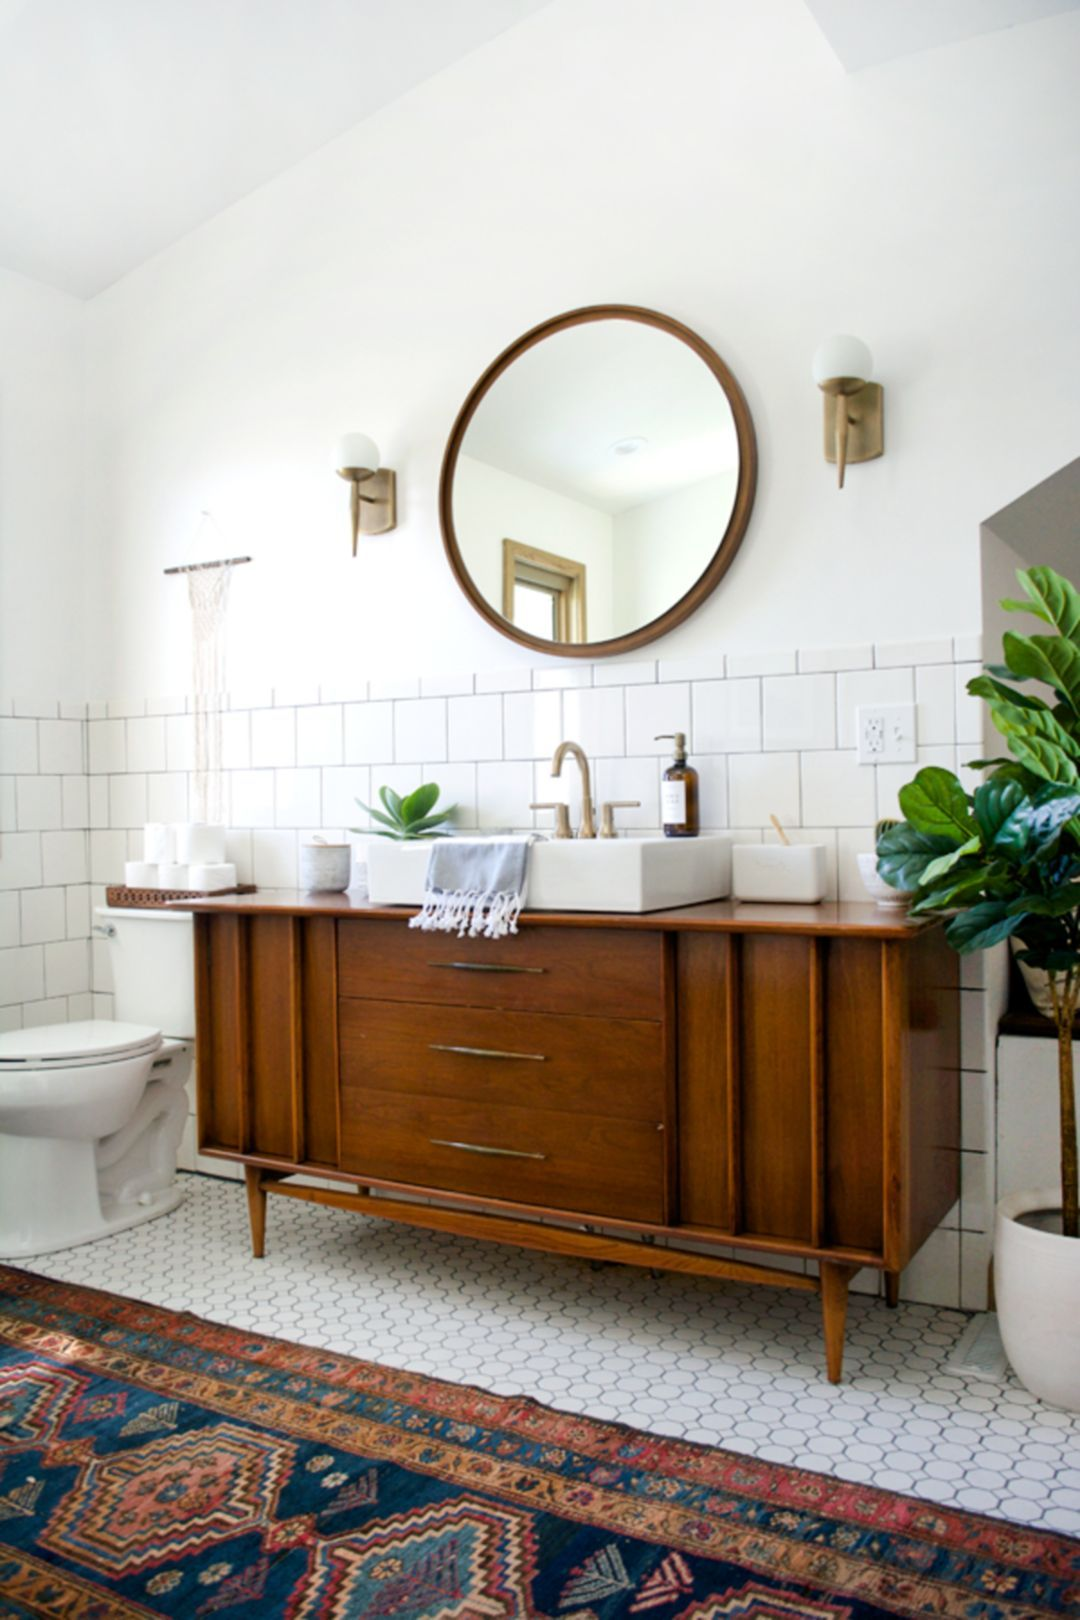 34+ Vintage bathroom cabinet ideas model